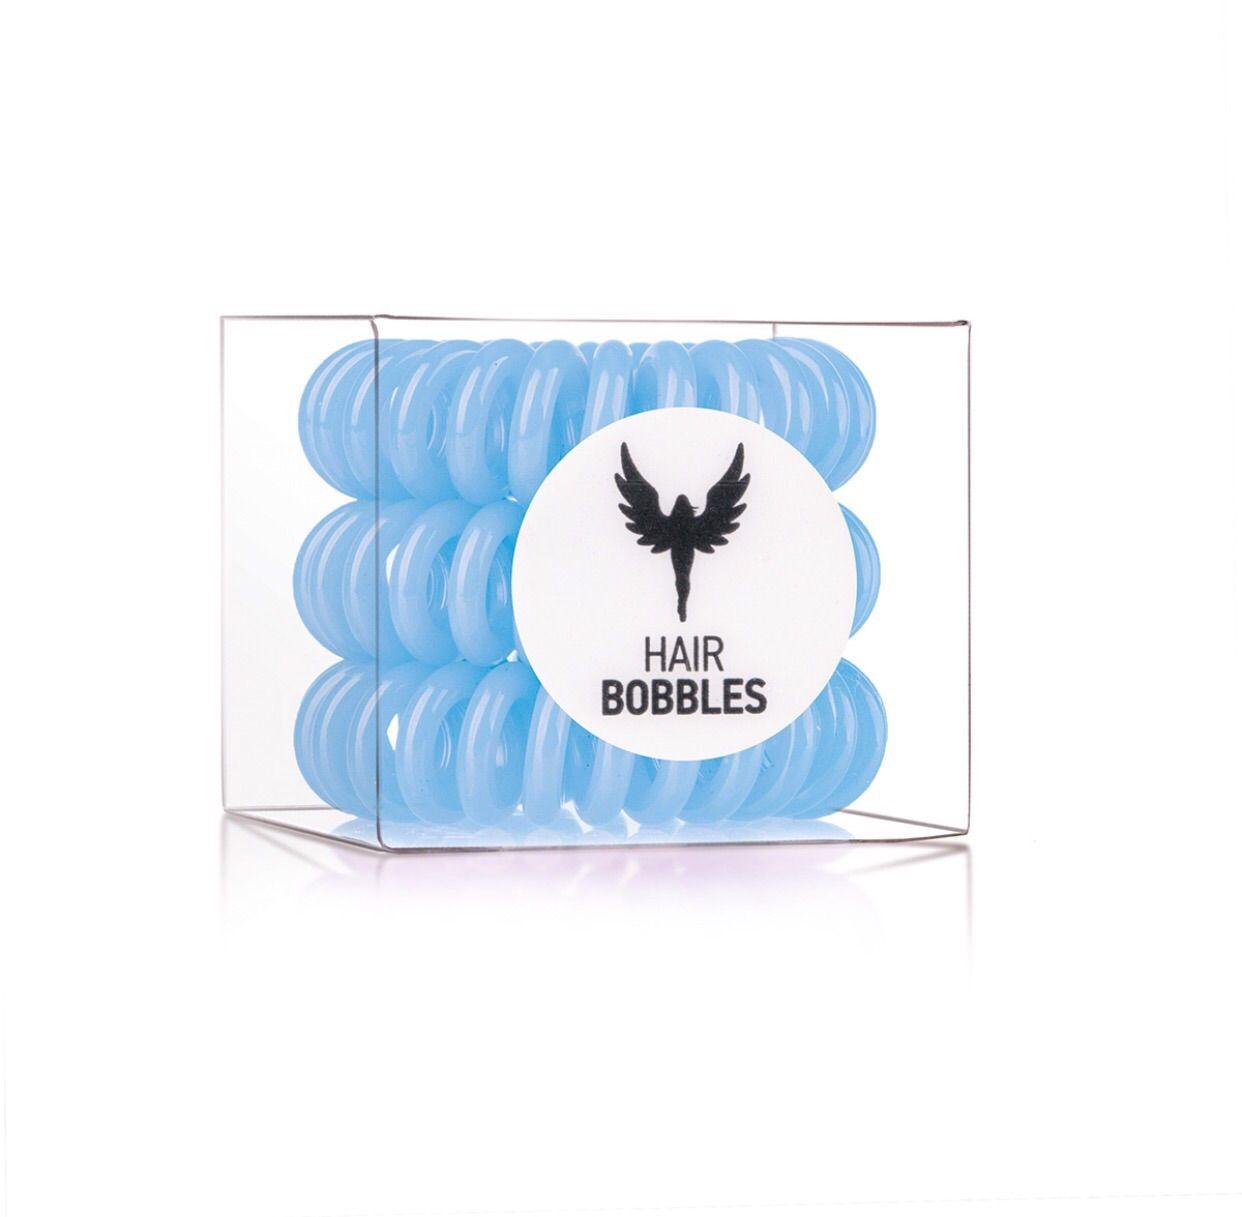 Hh Simonsen Hair Bobbles Azzurro Elastico Per Capelli - 3 PZ